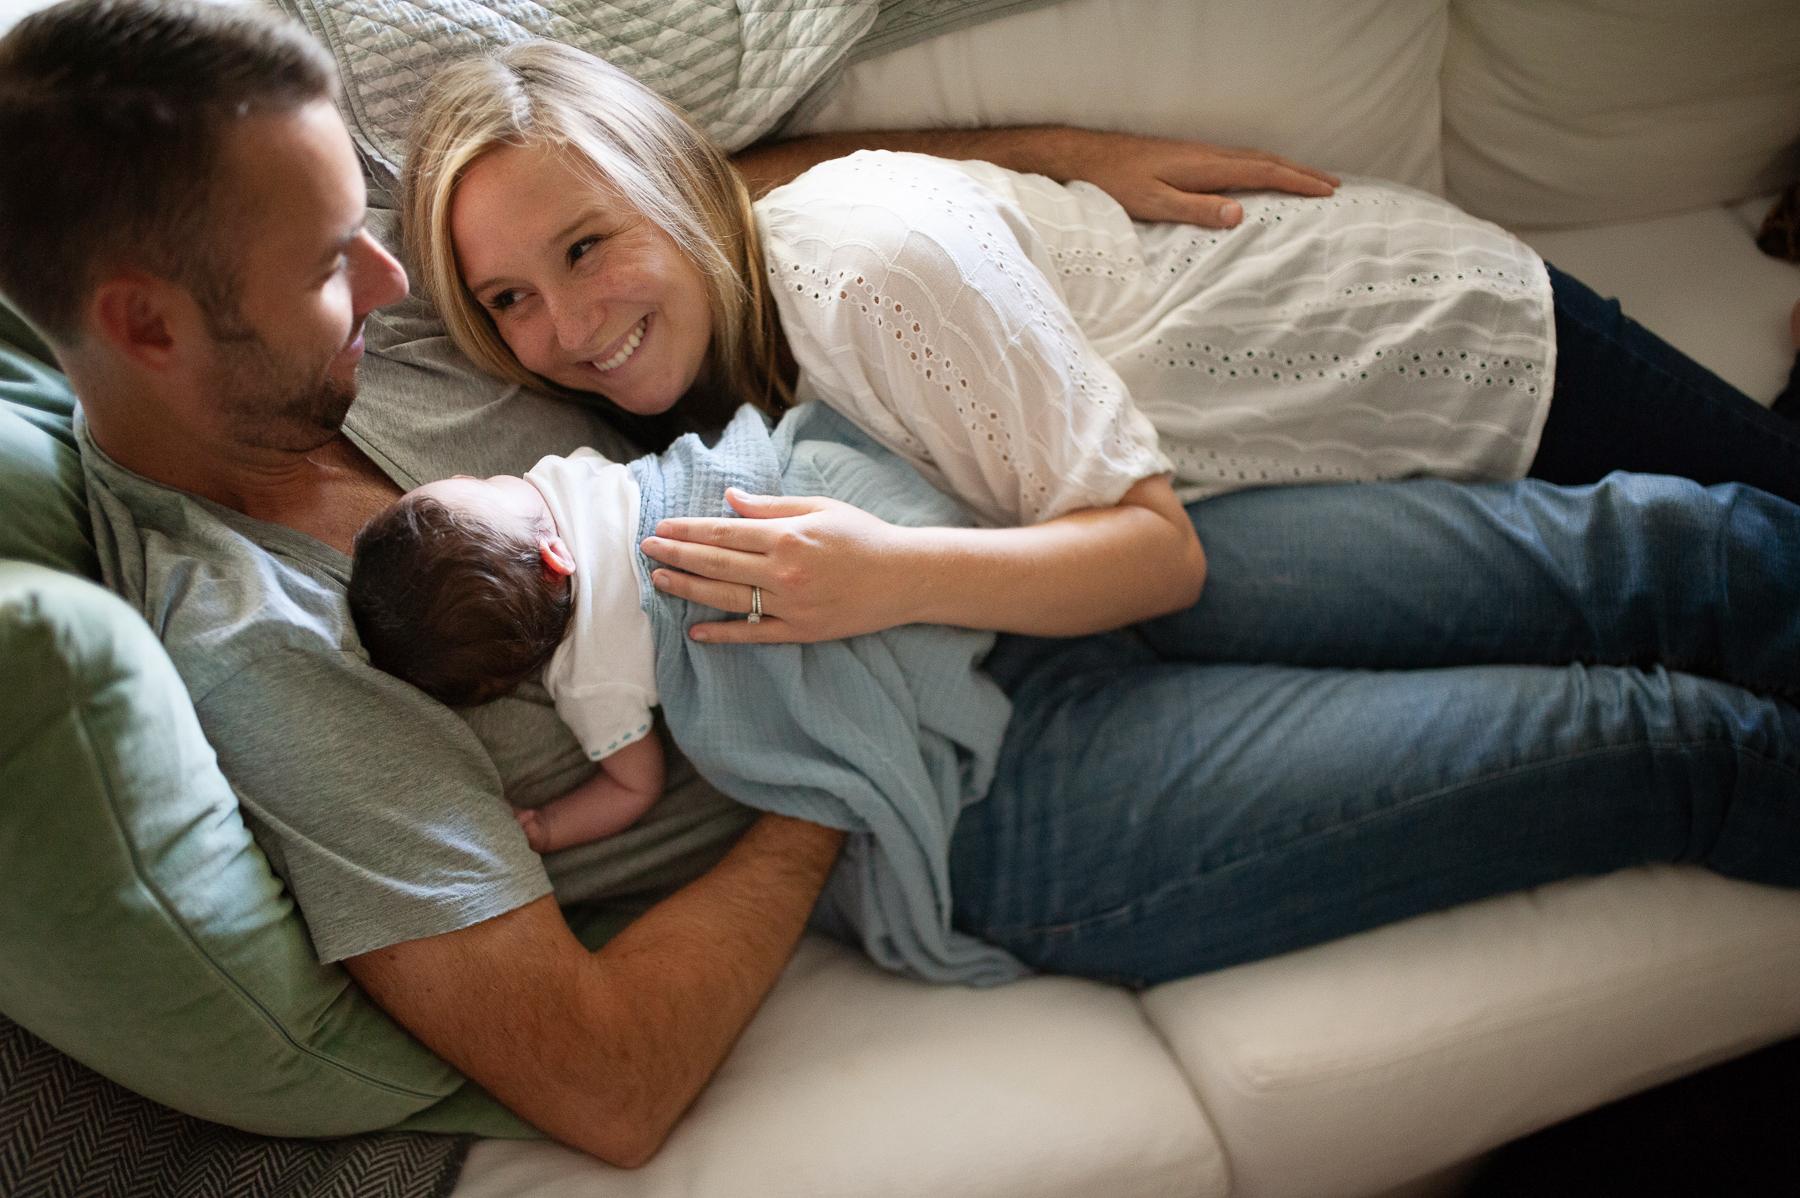 ClaireElisePhotography_Newborn-156.jpg